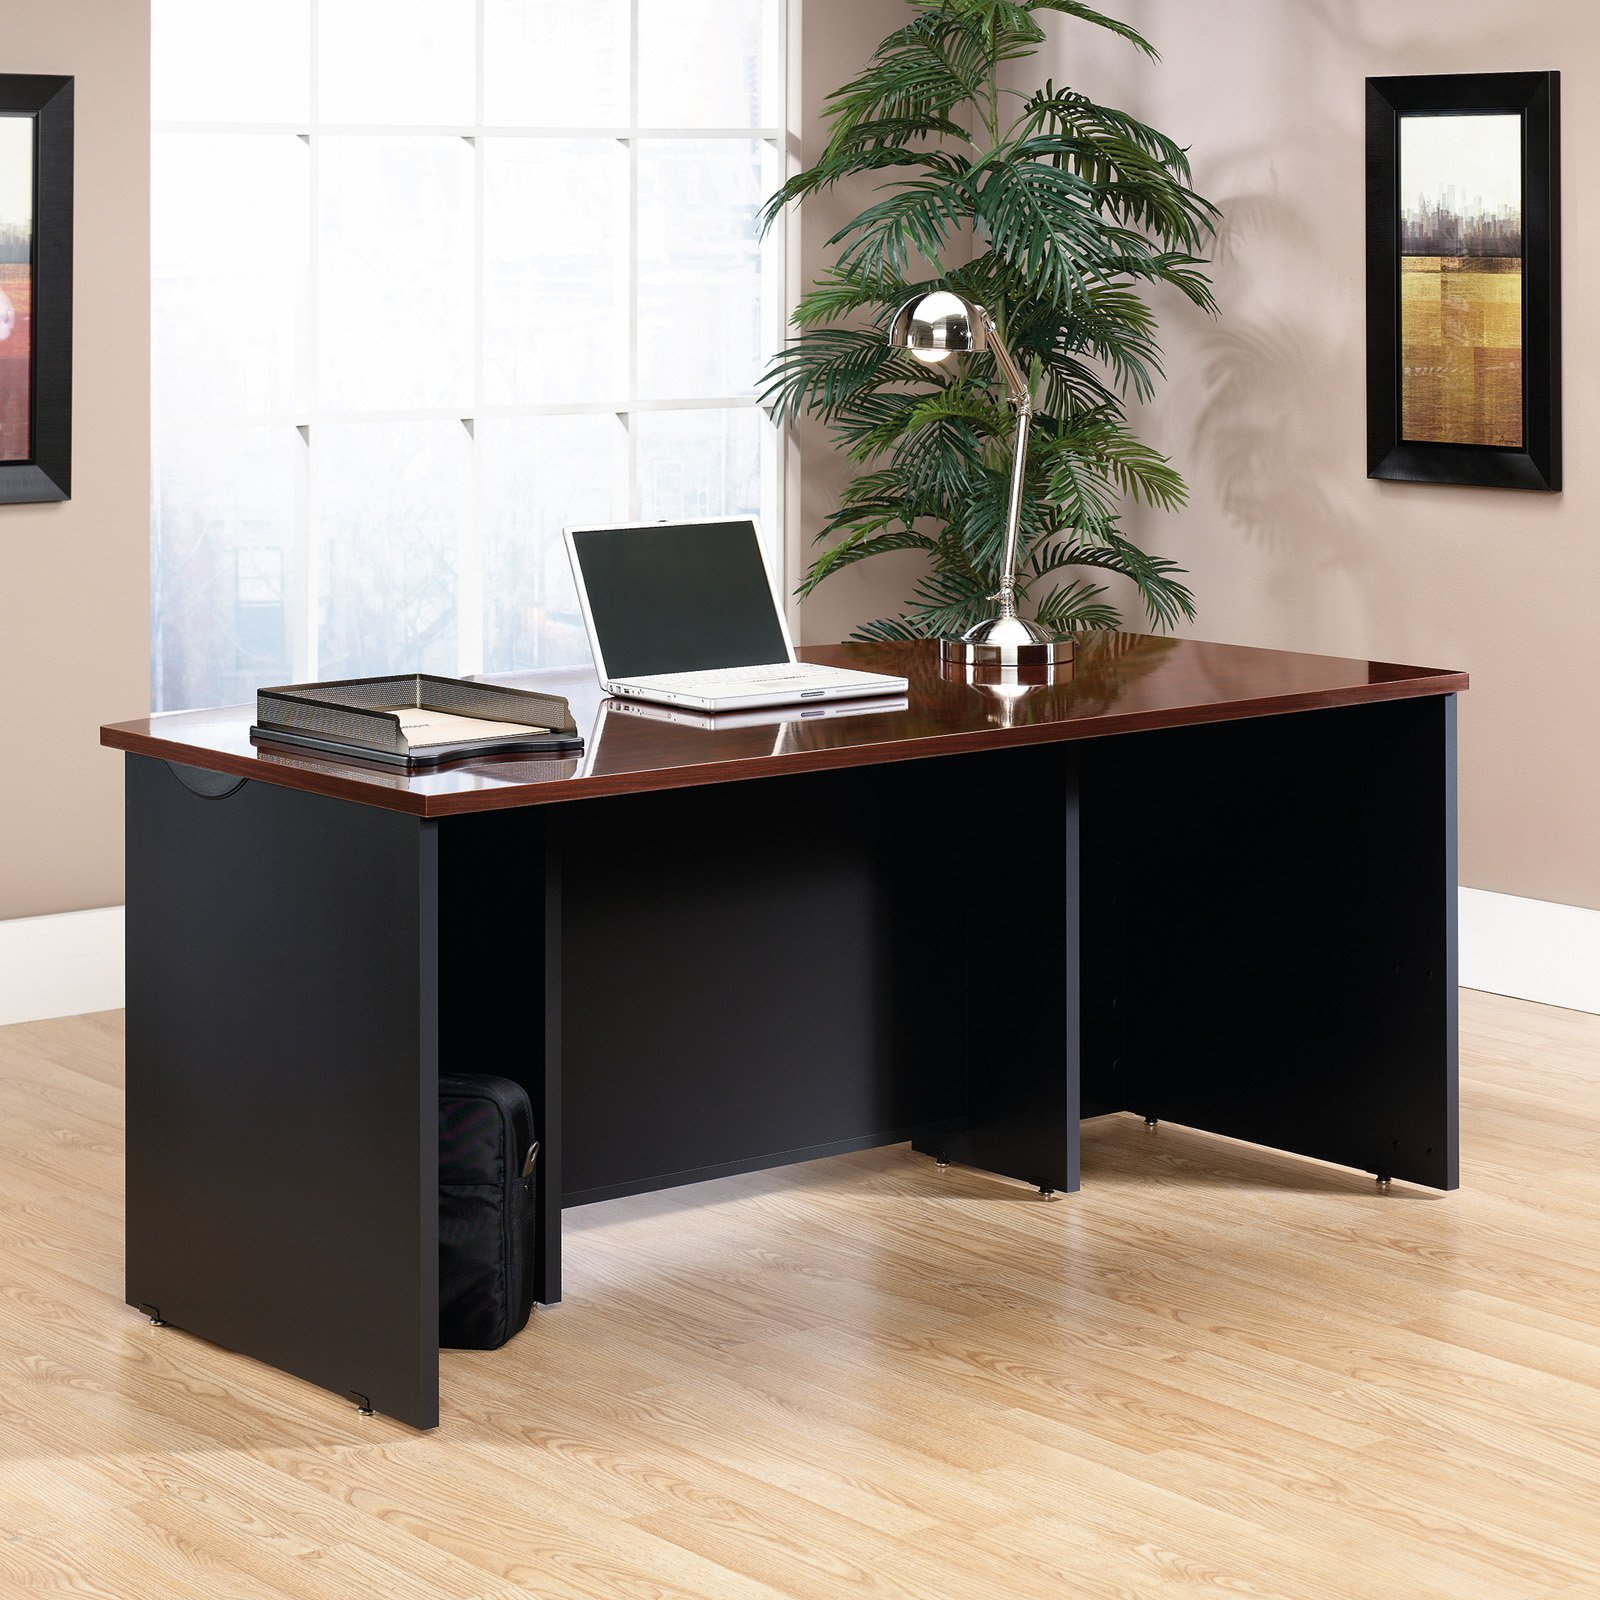 Sauder Office Furniture Via Executive Desk in Classic Cherry